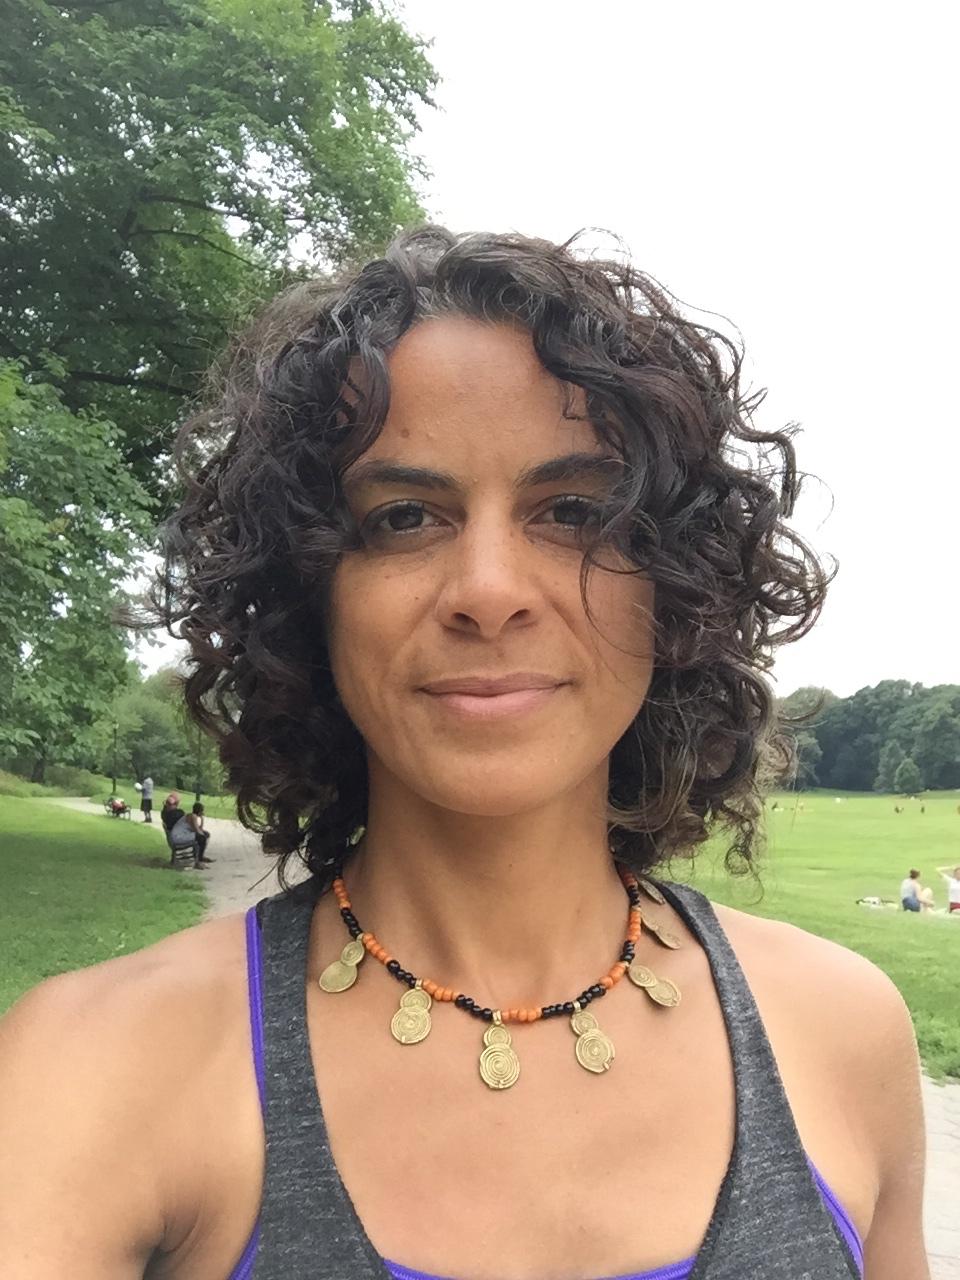 Shawna teaches trauma-informed yoga for Exhale to Inhale